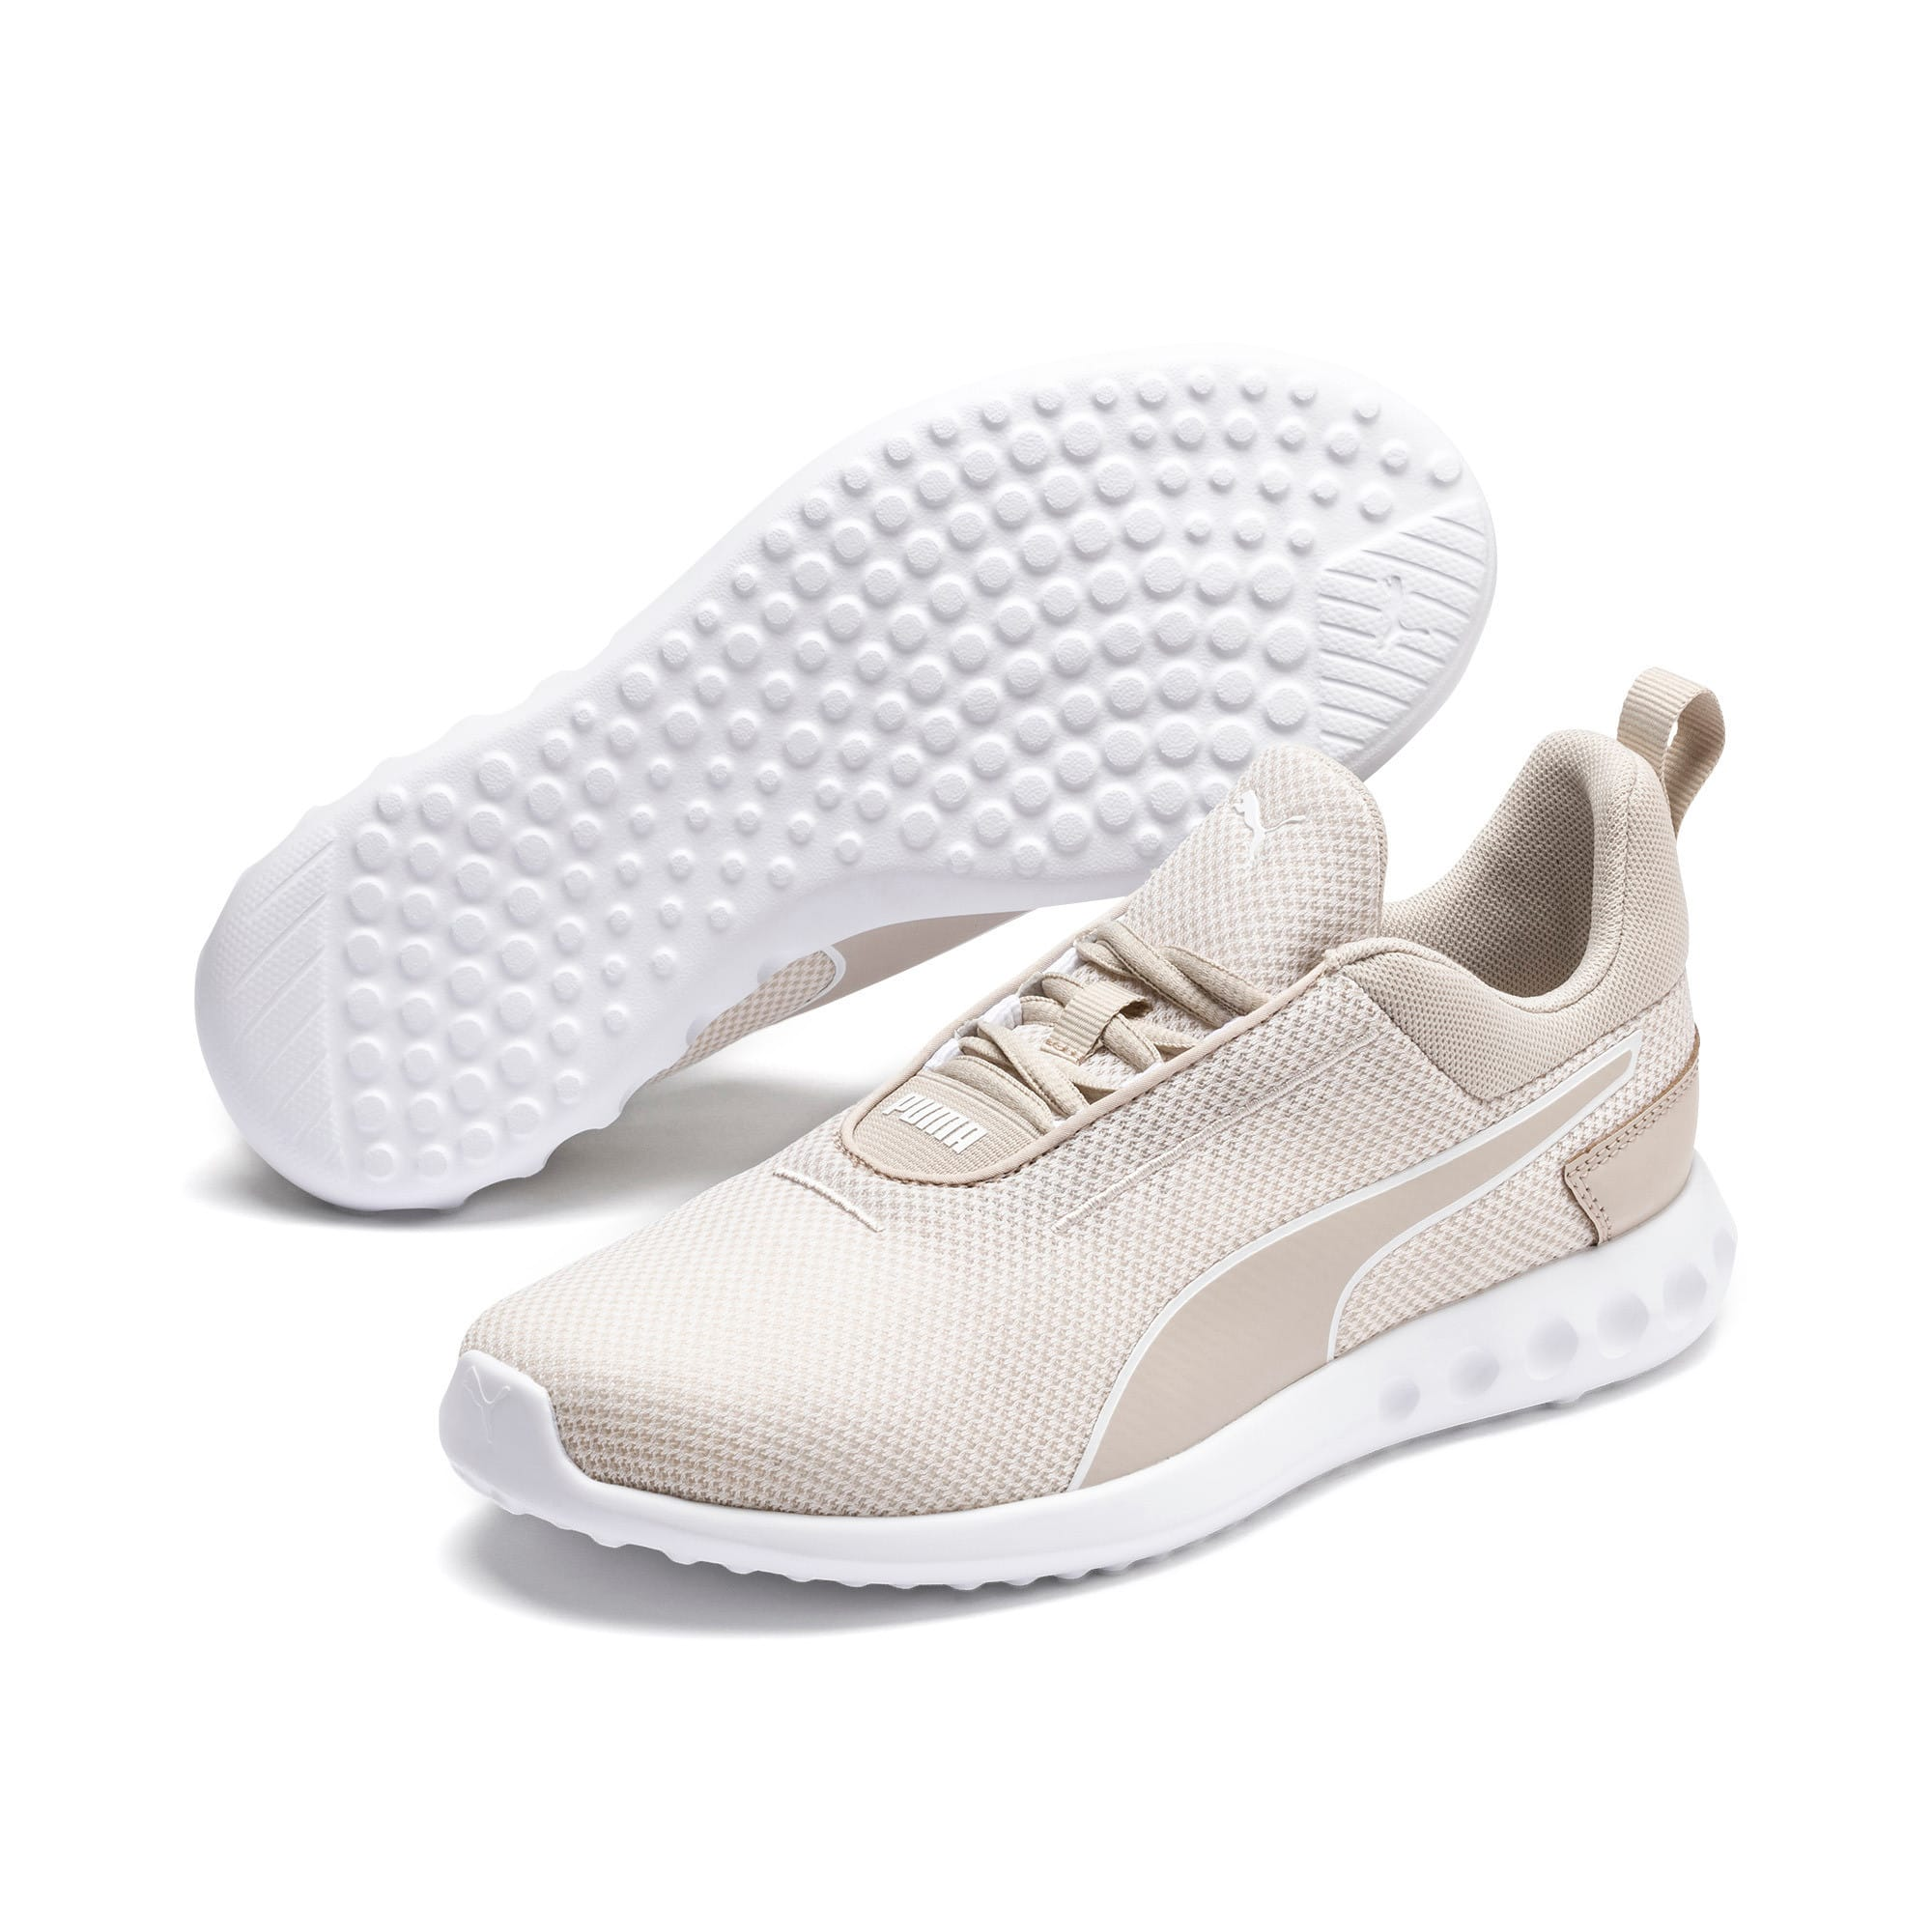 Thumbnail 2 of Carson 2 Concave Women's Training Shoes, Silver Gray-Puma White, medium